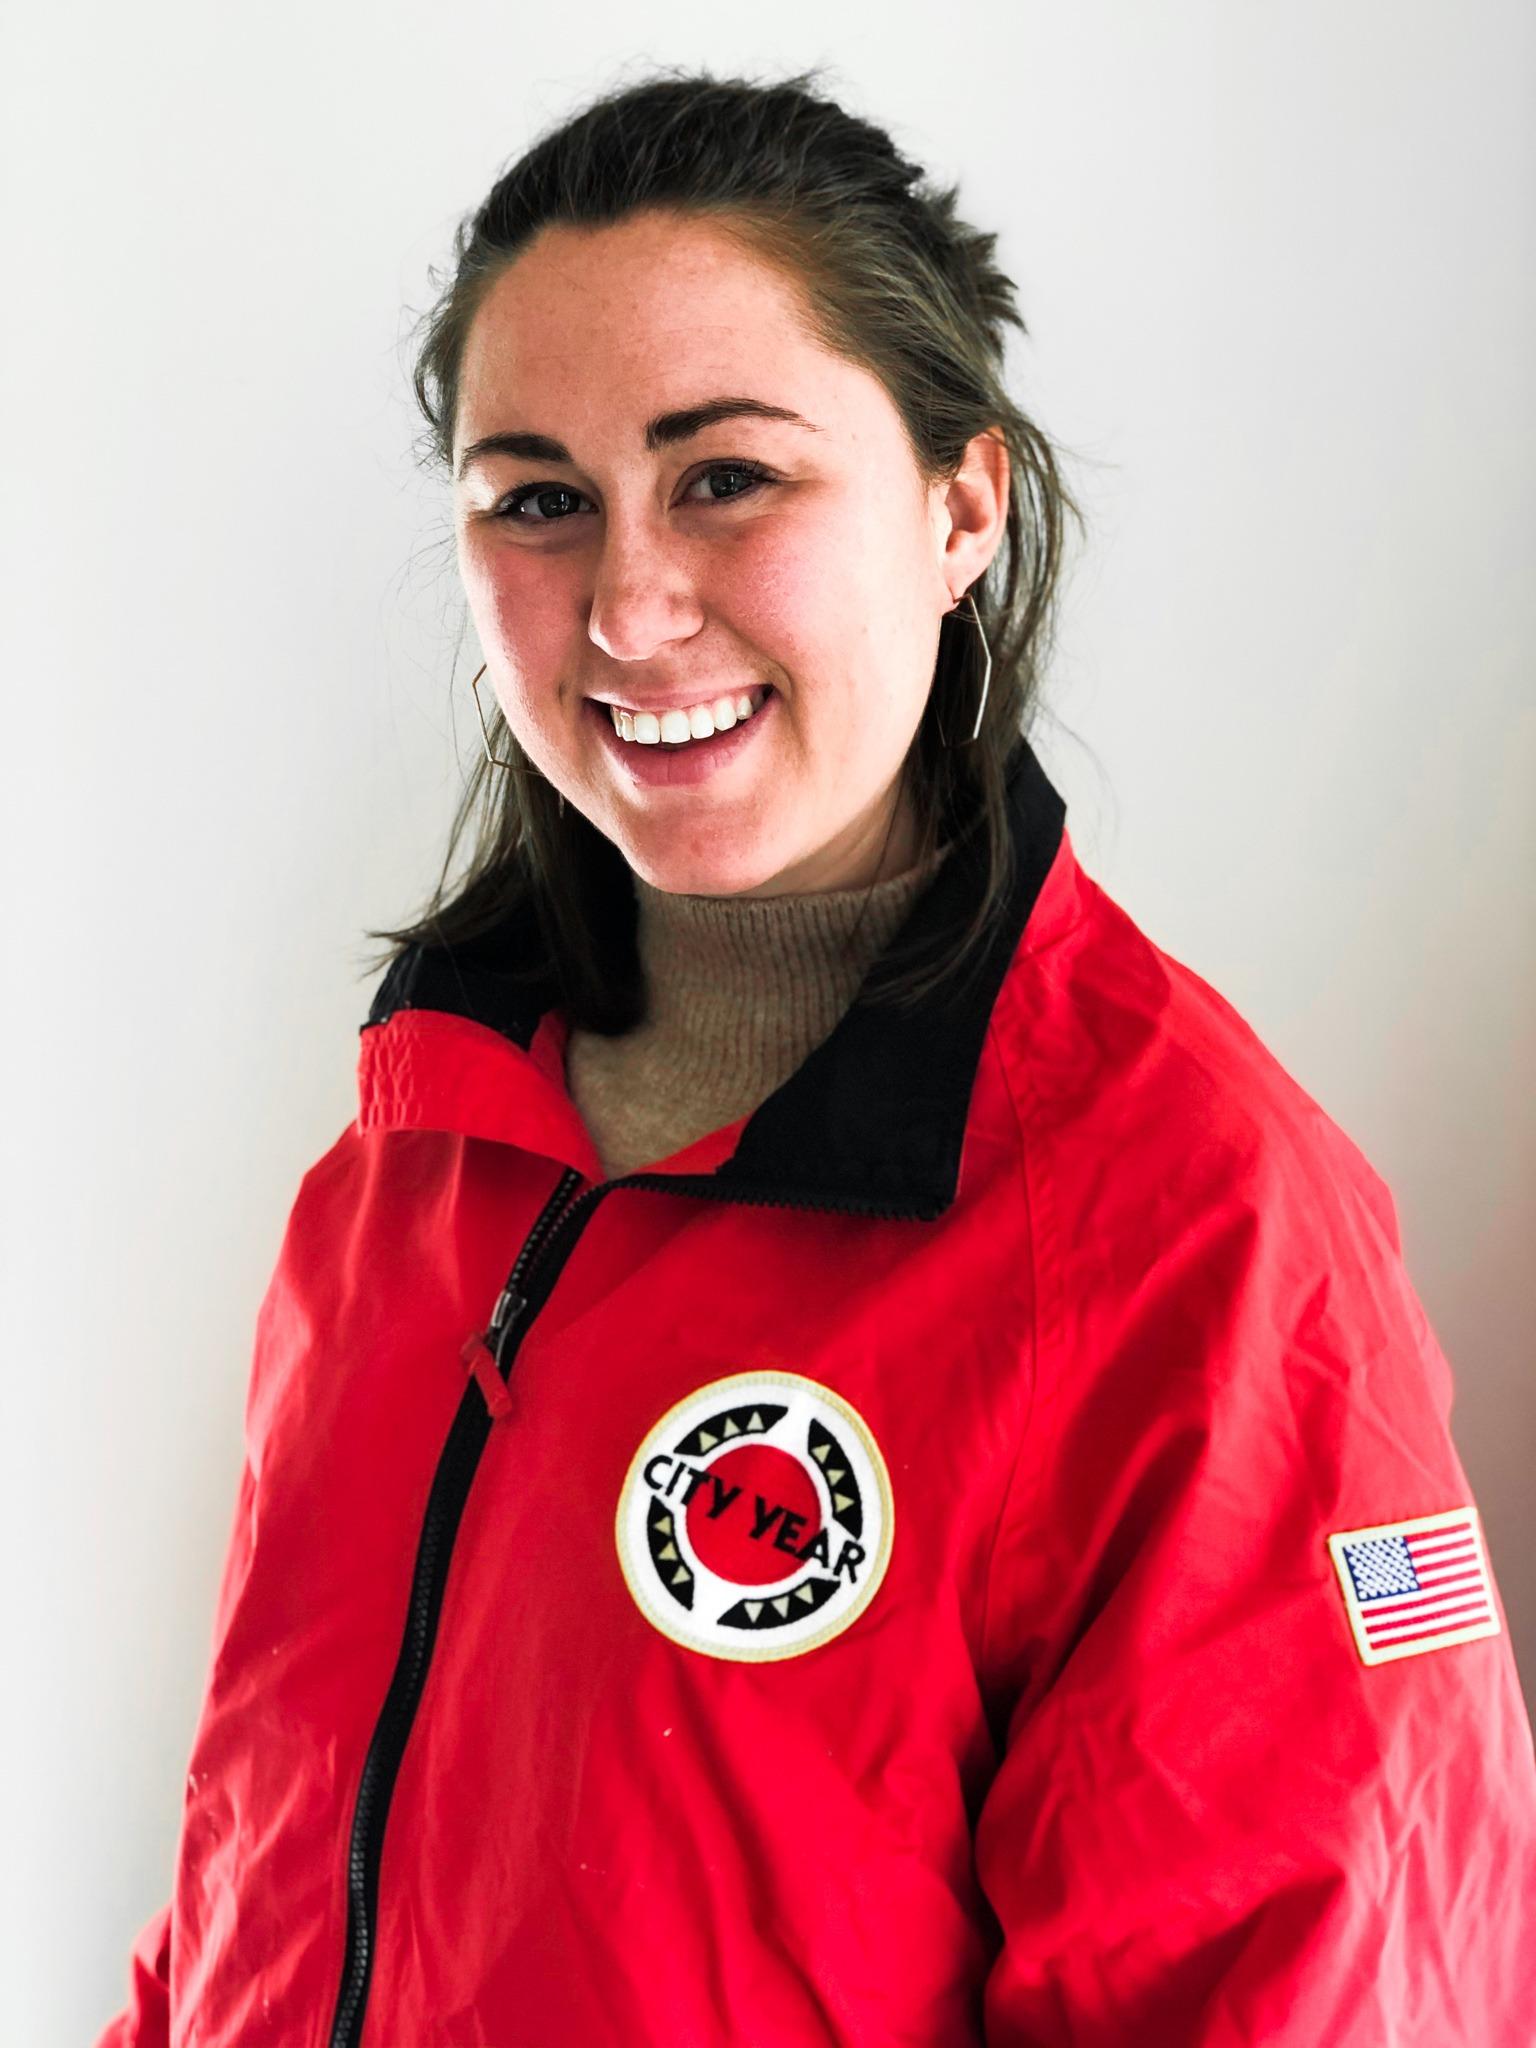 Ellie Carver in a CY red jacket